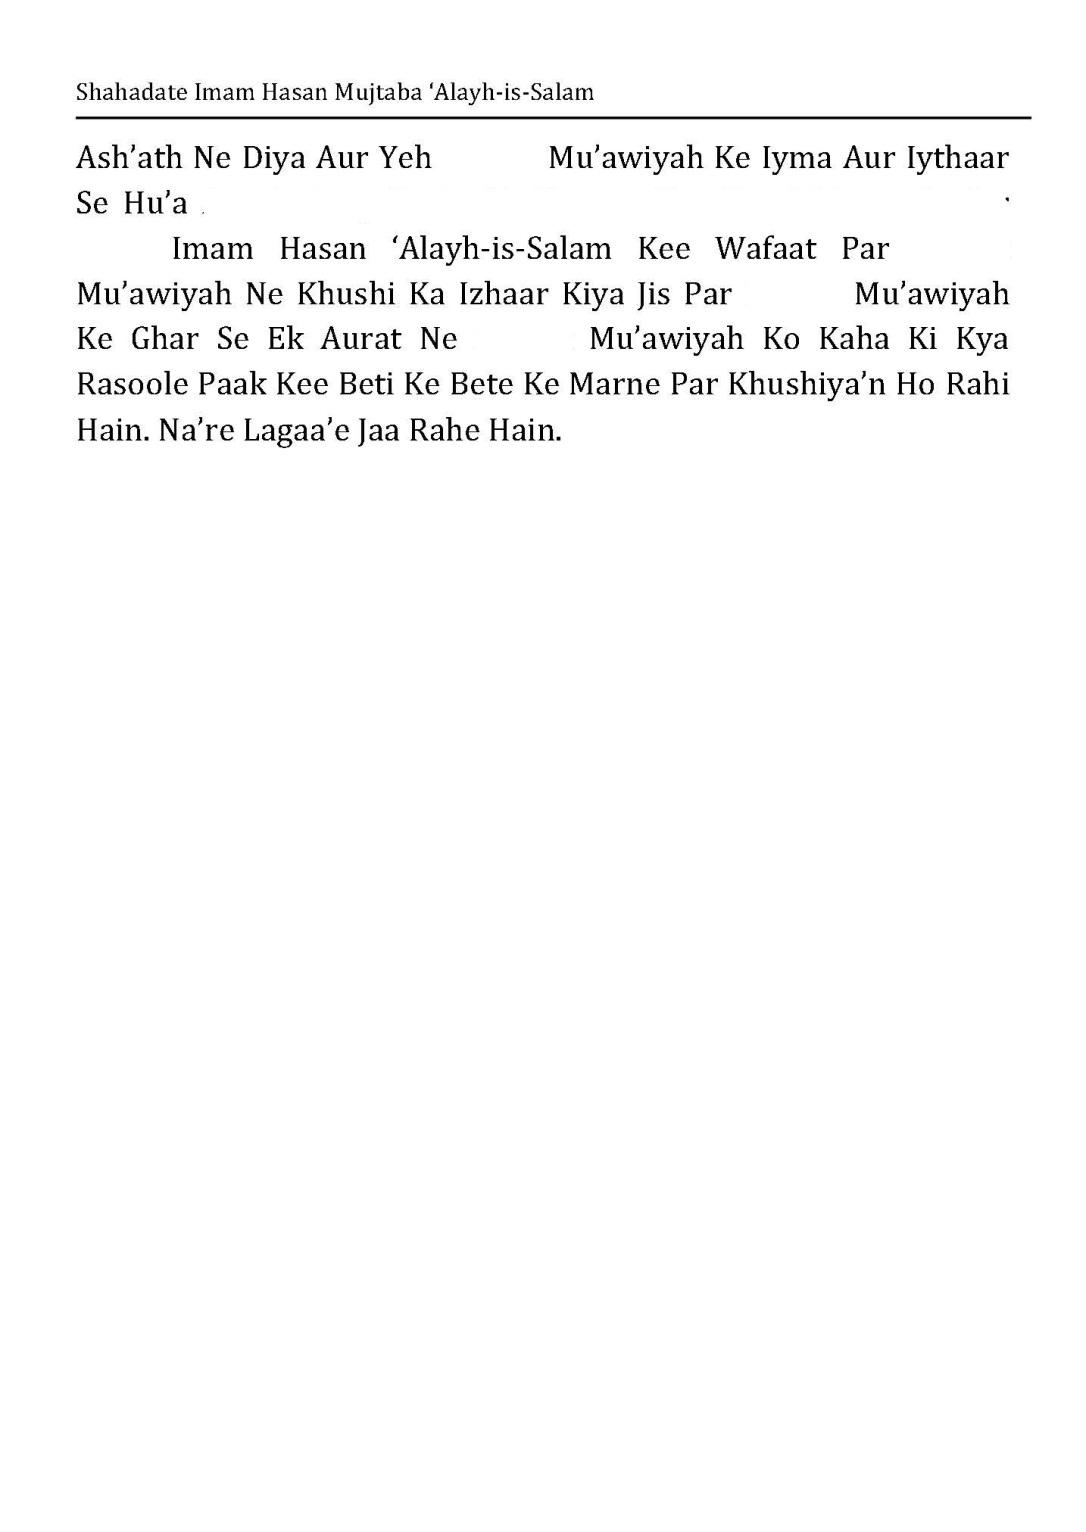 shahadate-imam-hasan-mujtaba-e28098alayh-is-salam-pdf_unlocked_Page_16